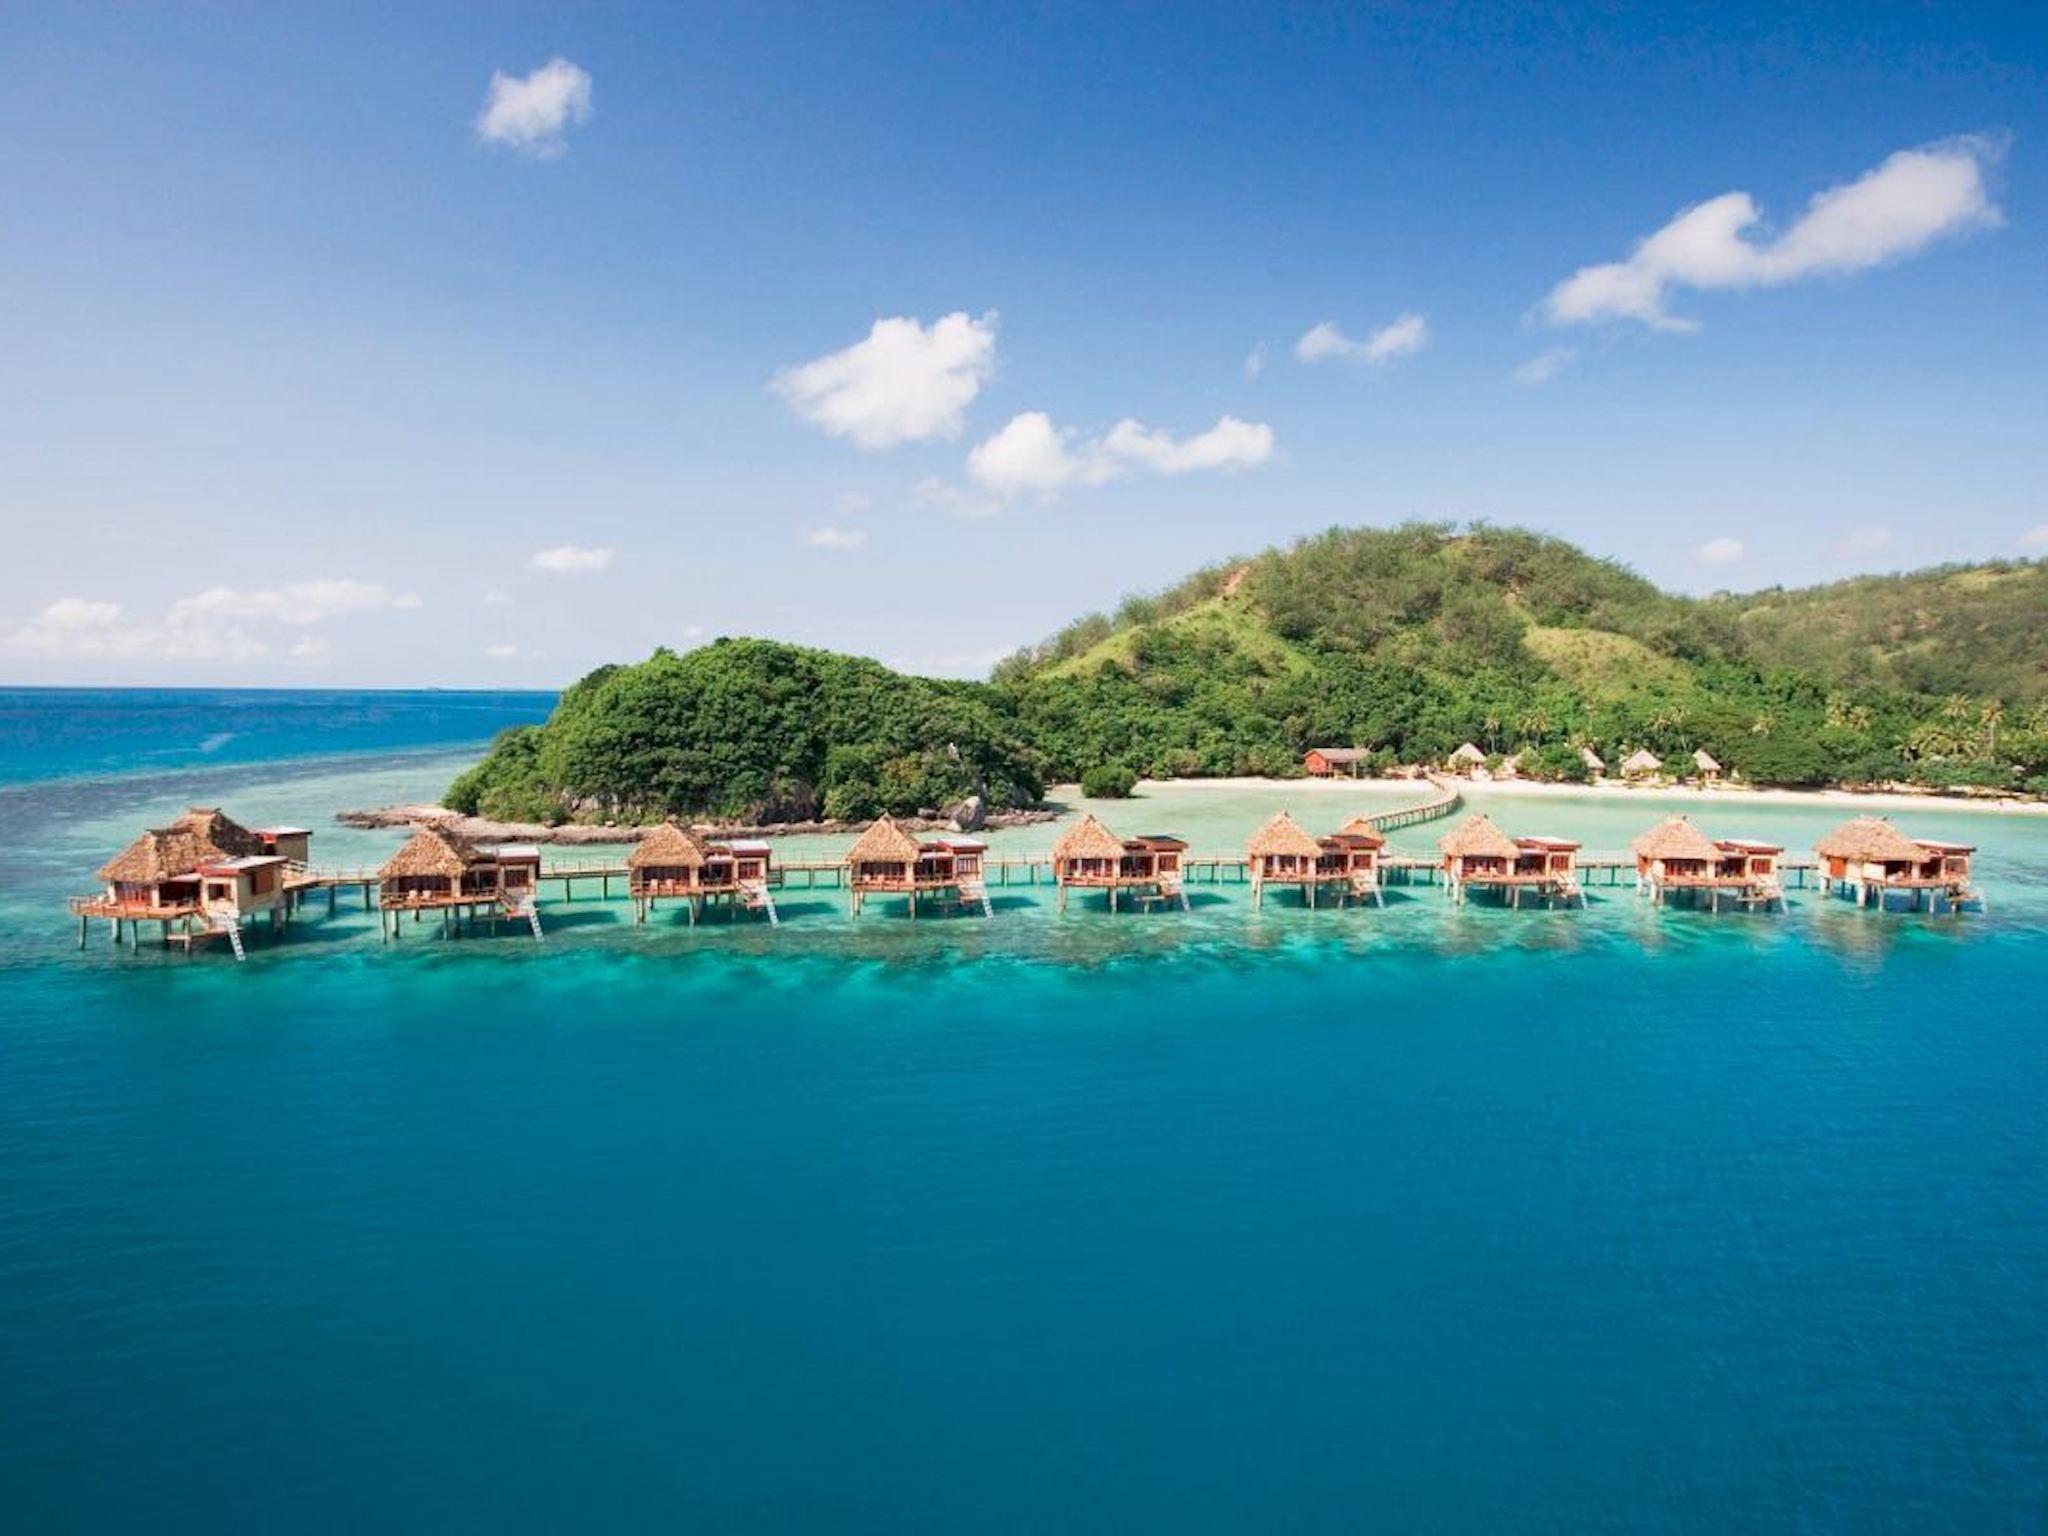 Likuliku Lagoon Resort, Mamanuca Archipelago, Fiji